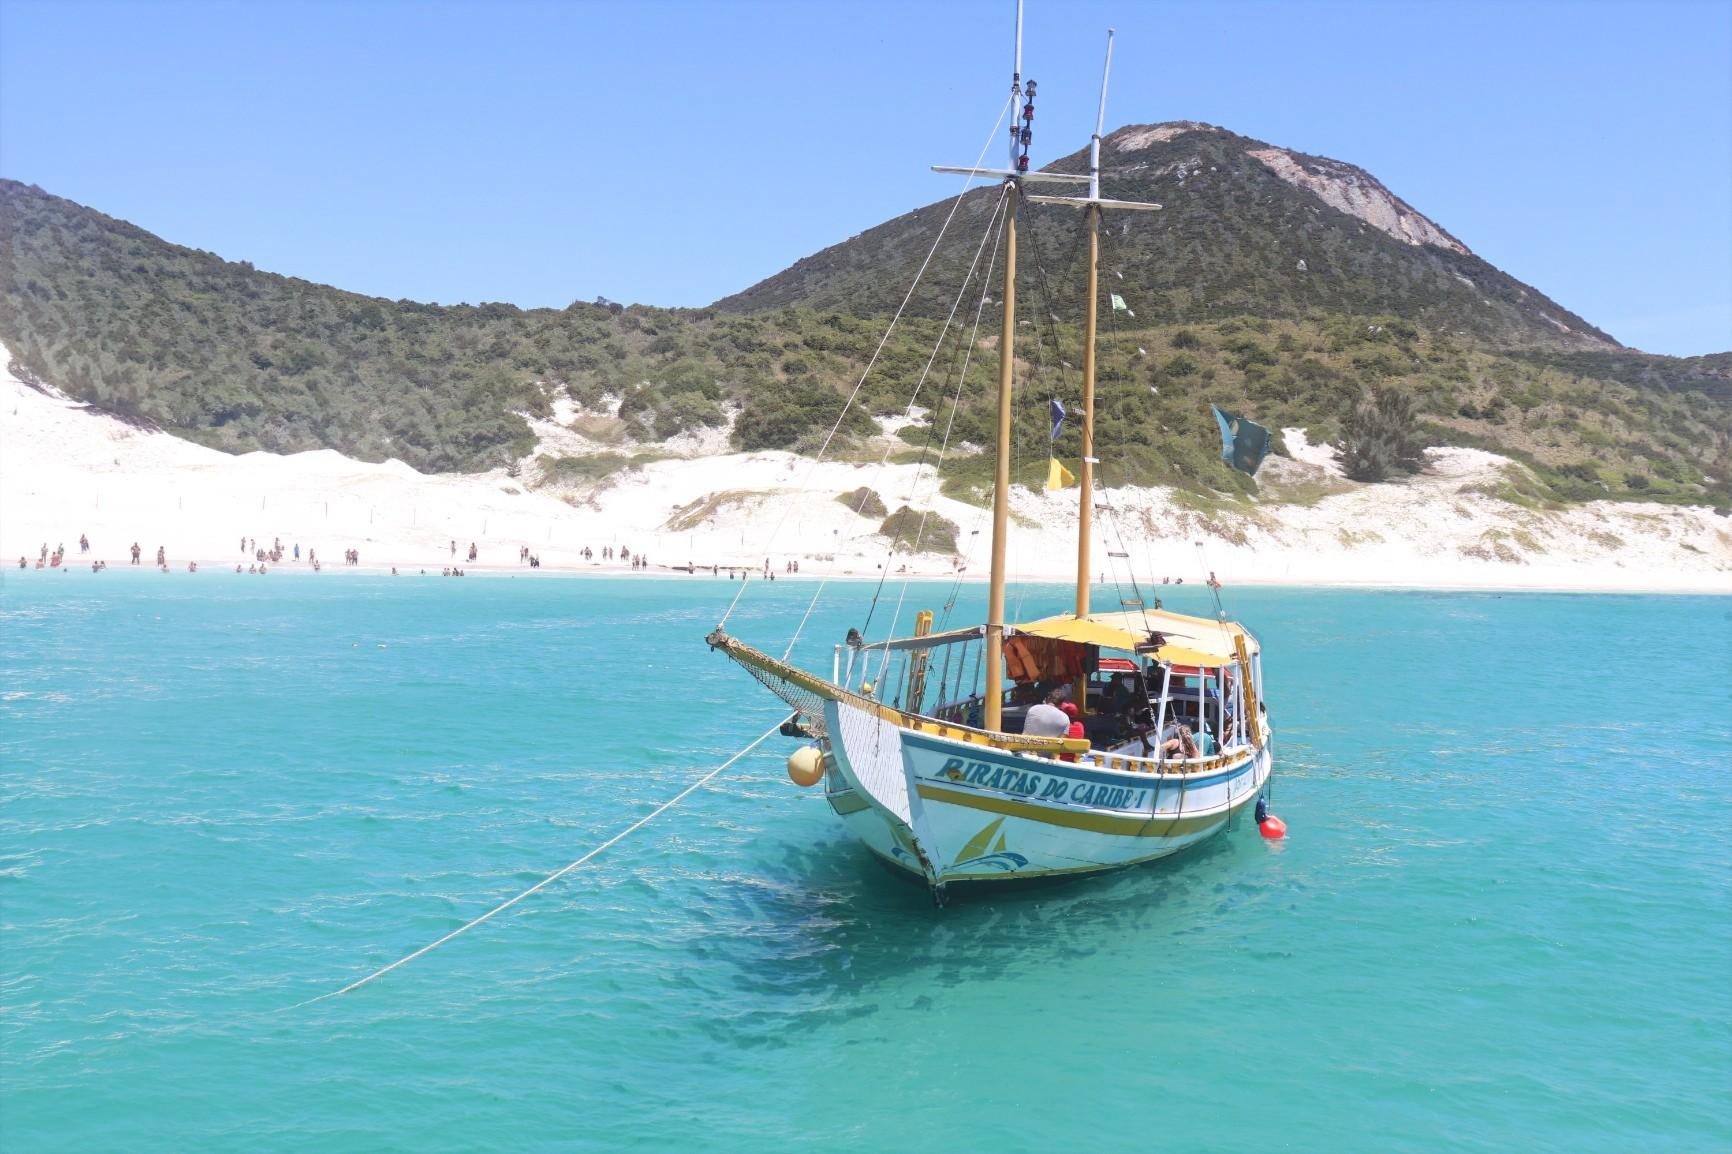 Arraial do Cabo: Crystal Clear Caribbean Waters In Rio de Janeiro, Brazil